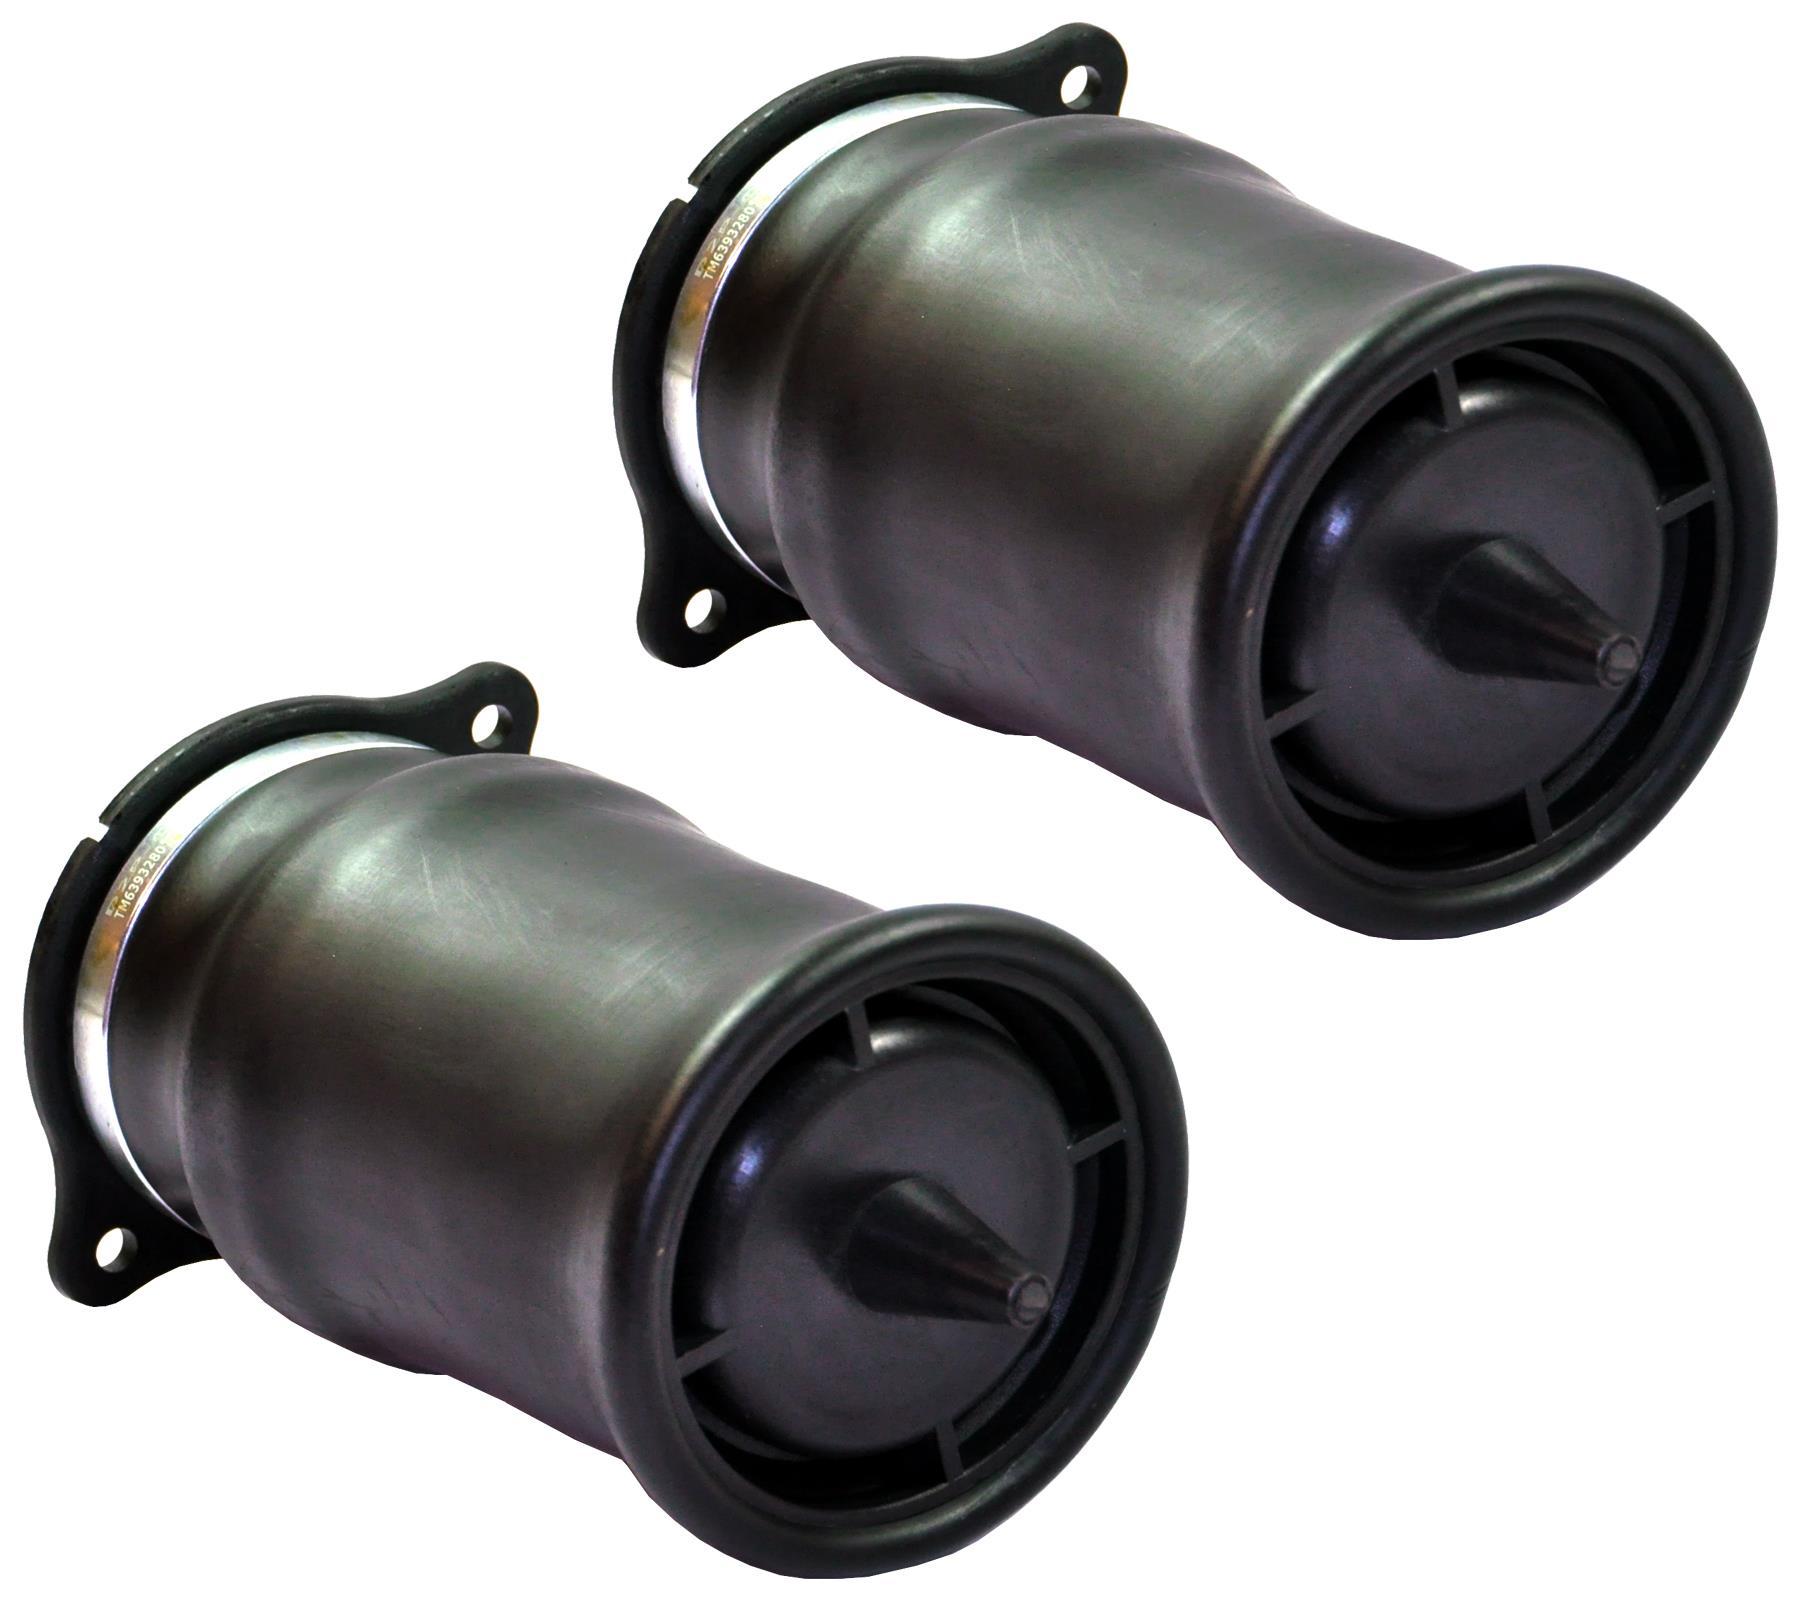 Air Suspension Parts For Mercedes Viano,Vito, Vito/Mixto W639 Pair Of Rear Air Suspension Spring Bags [tag]